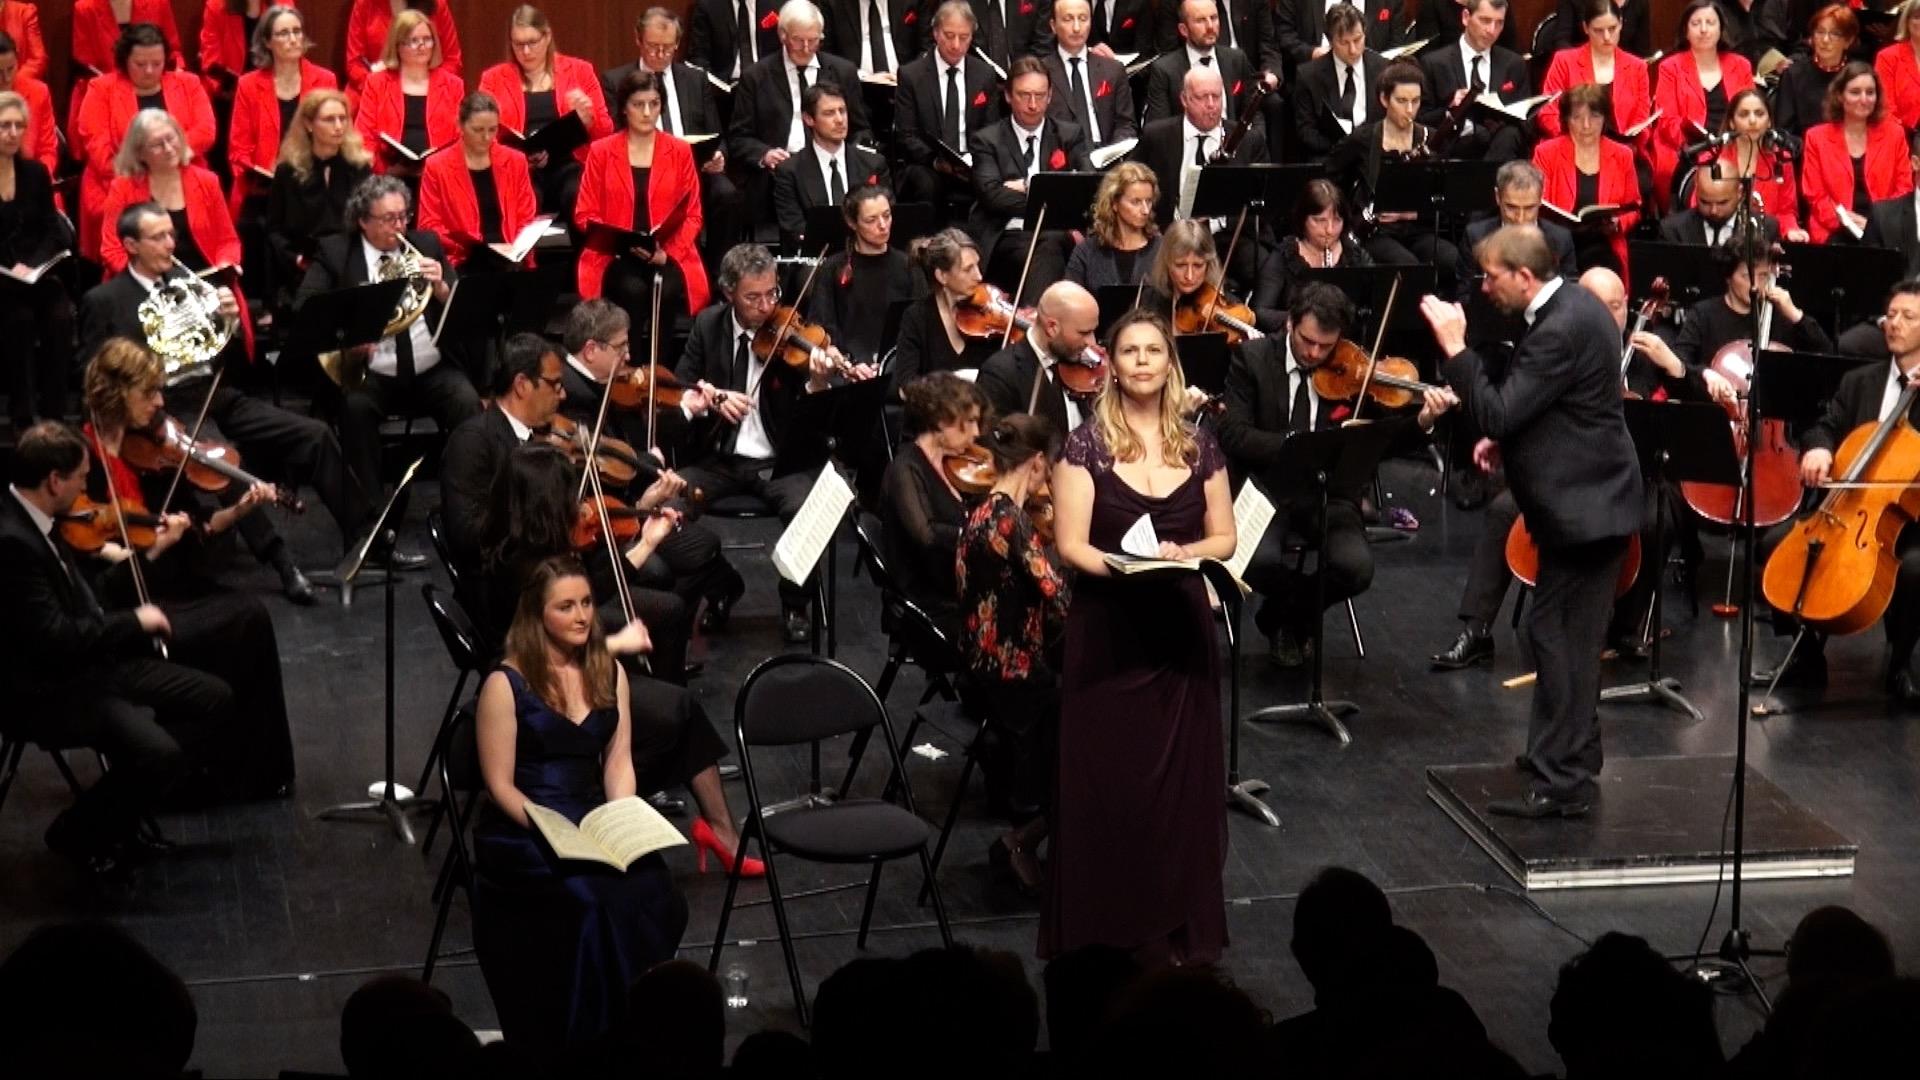 Mozart: Great Mass in C minor,Ensemble Orchestral des Hauts-de-Seine. Courbevoie, photo: Erwan de Kerautem